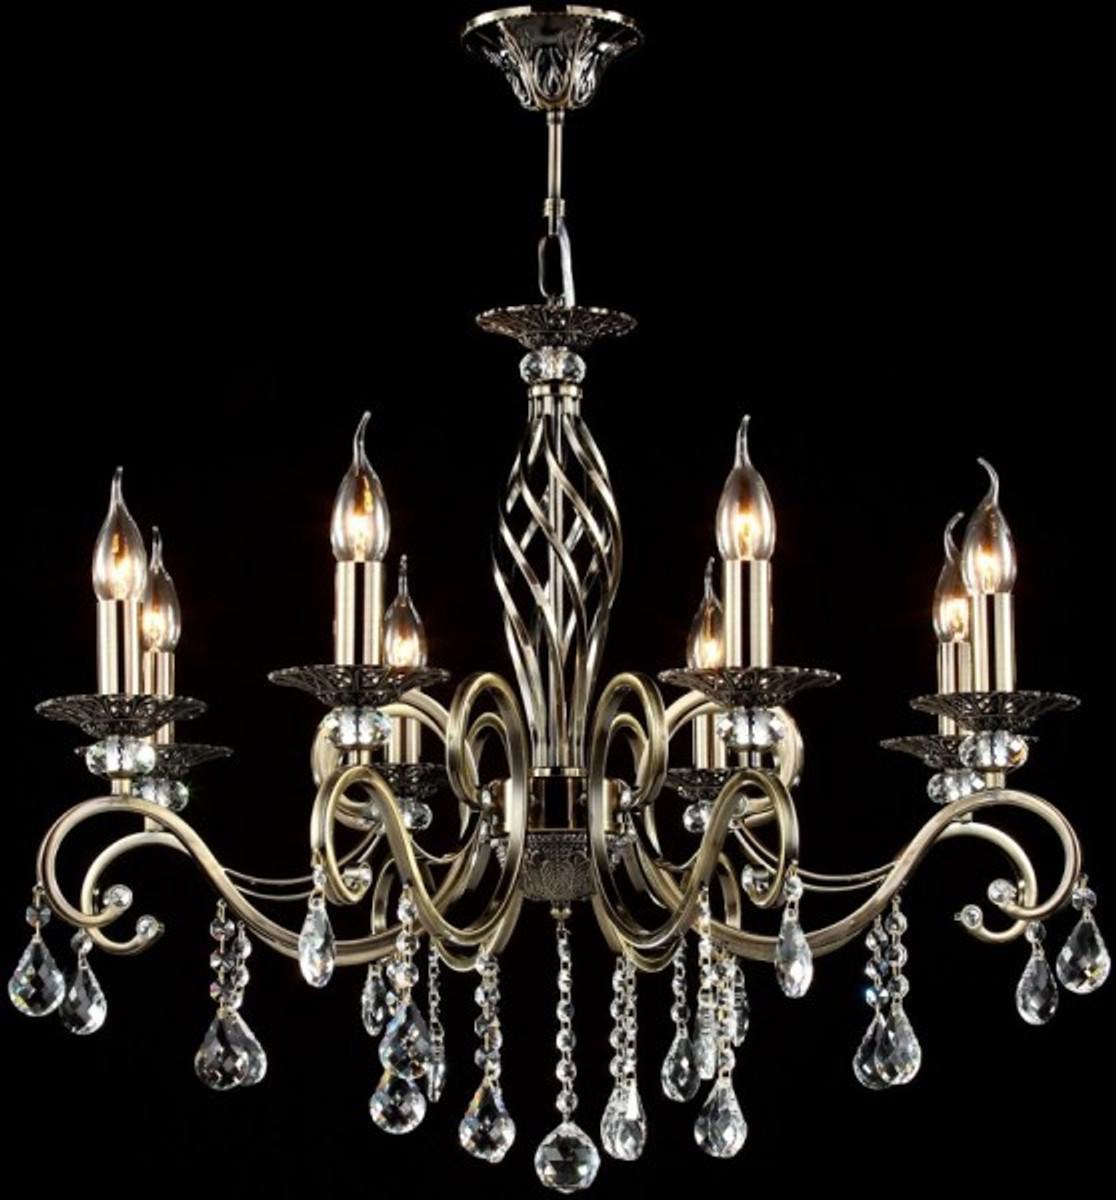 Casa padrino barock kristall decken kronleuchter bronze 72 x h 59 cm antik stil m bel l ster - Kronleuchter barock ...